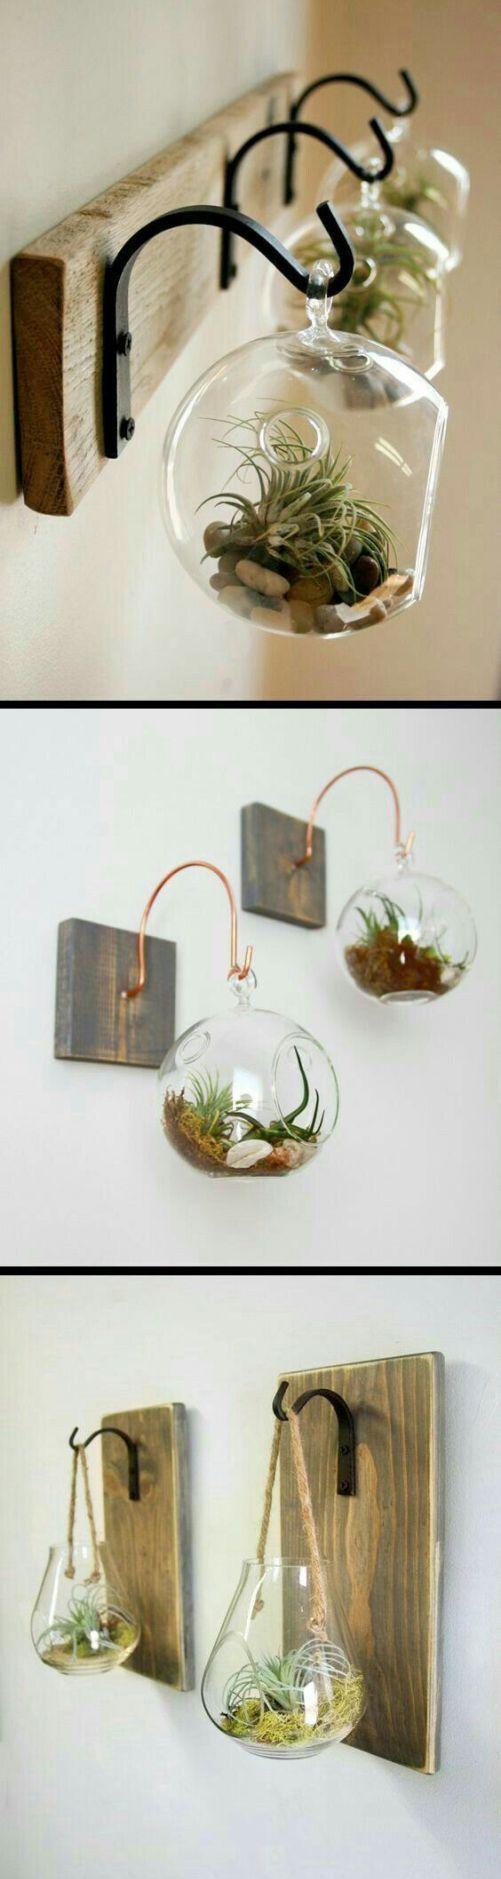 succulent plants decor ideas #gardeningindoorplants